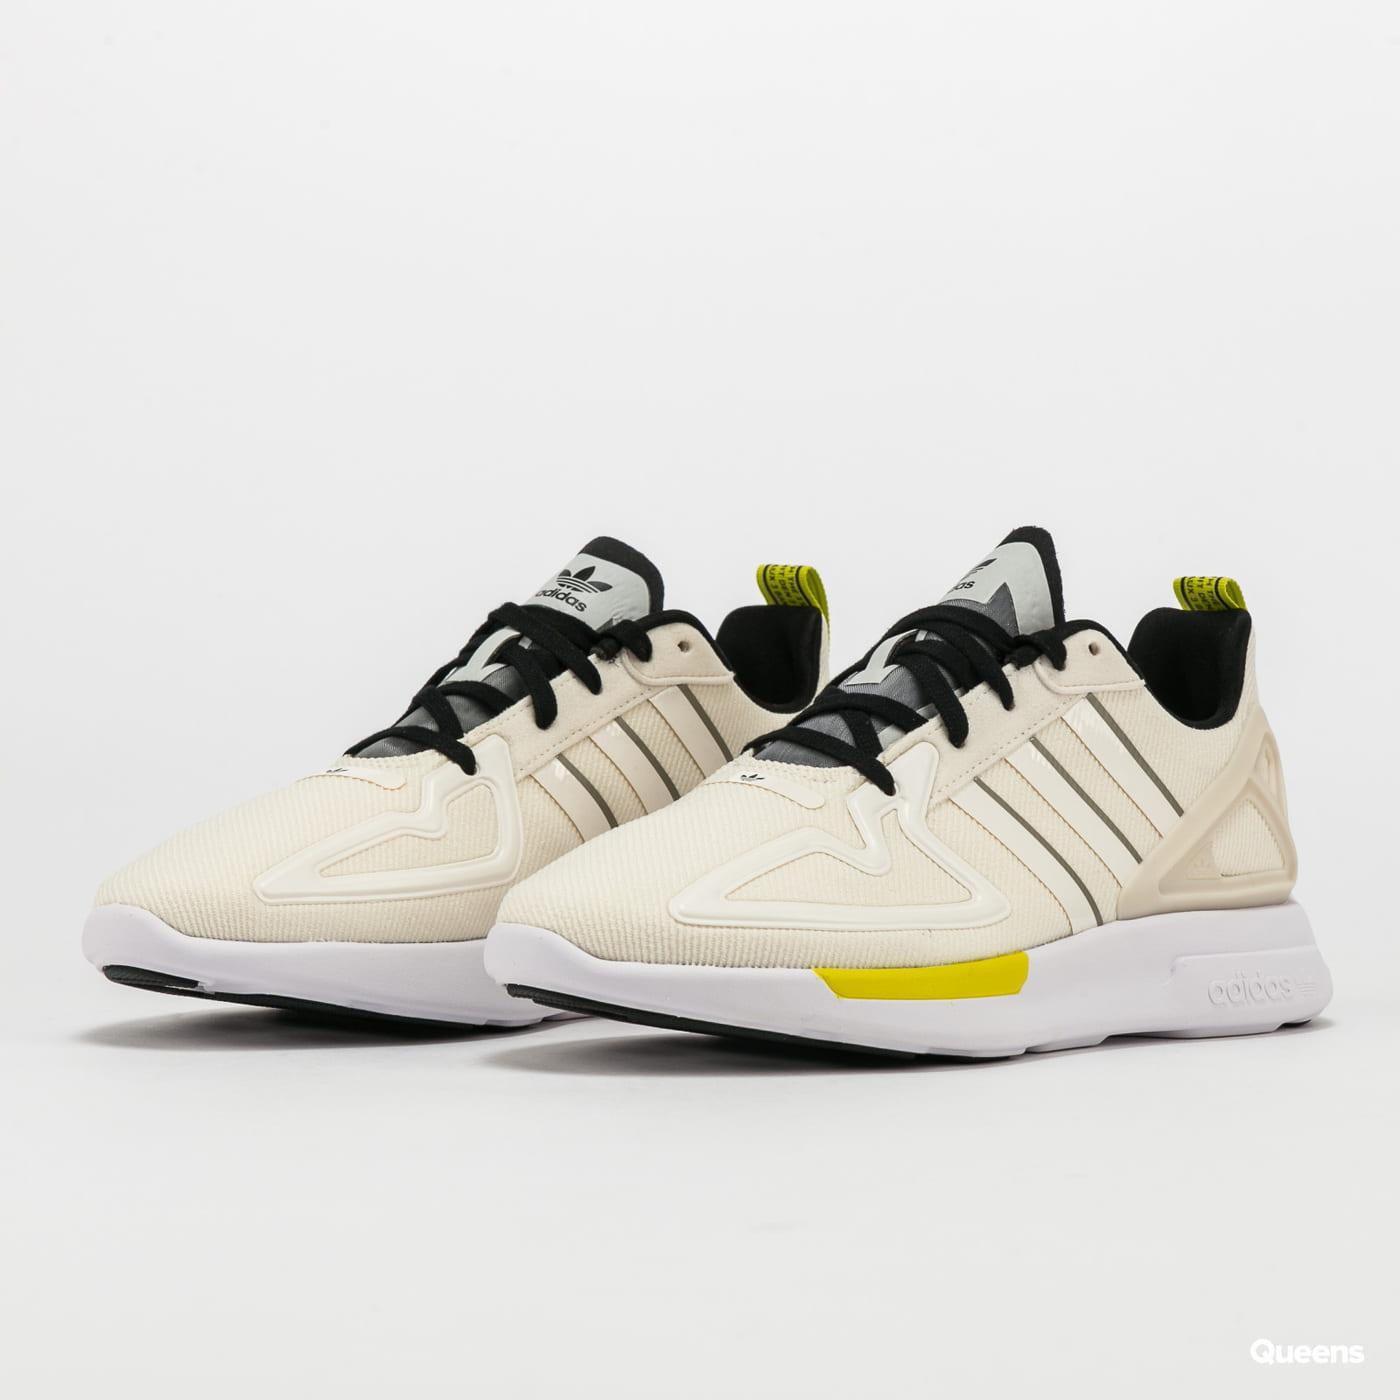 adidas Originals ZX 2K Flux W cwhite / cblack / feagry